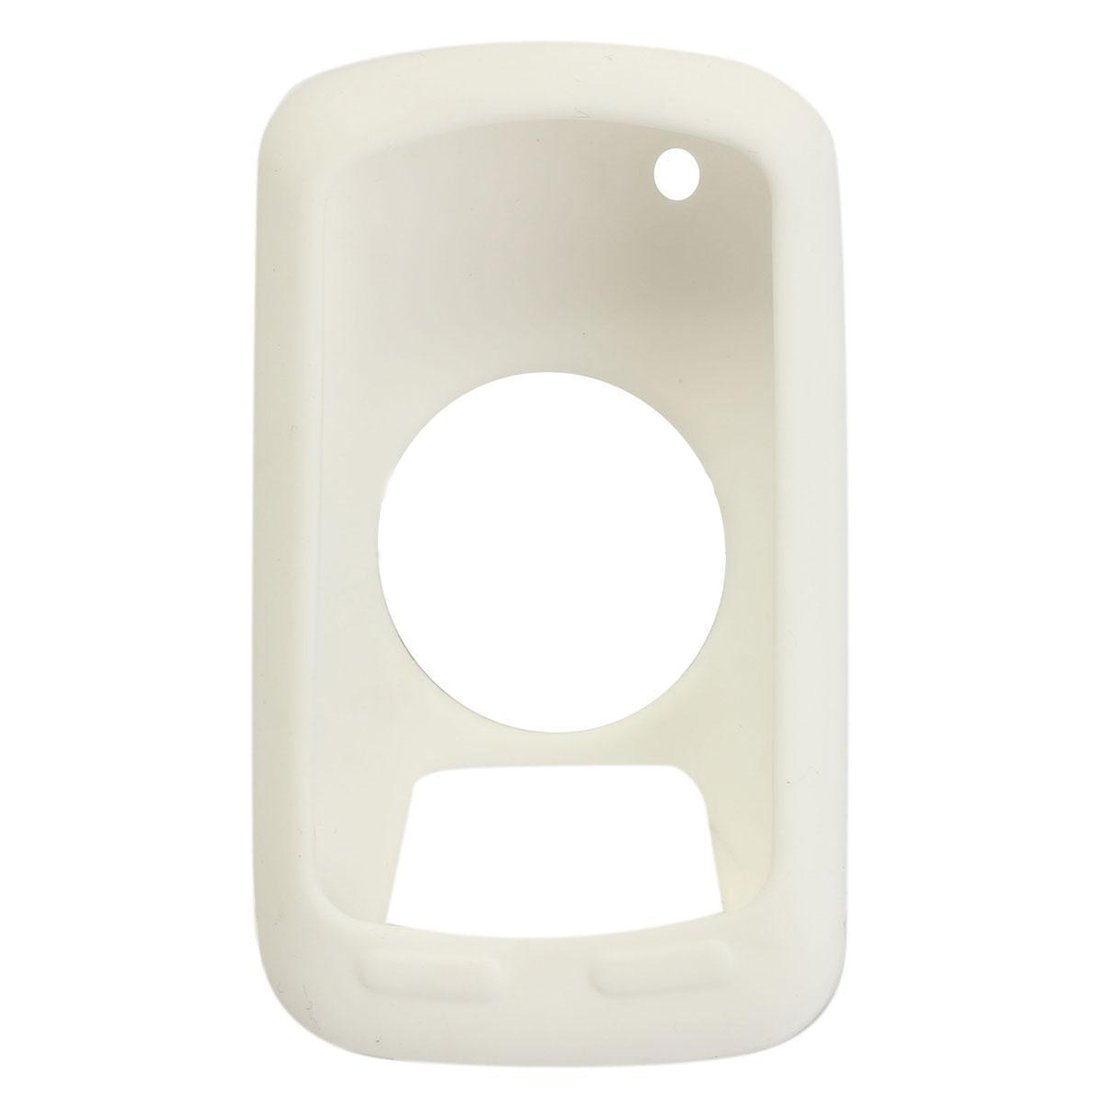 Protective Case - TOOGOO(R)Silicone Bag Protective Case Cover Shell for Garmin 800 810 Edge Color: White